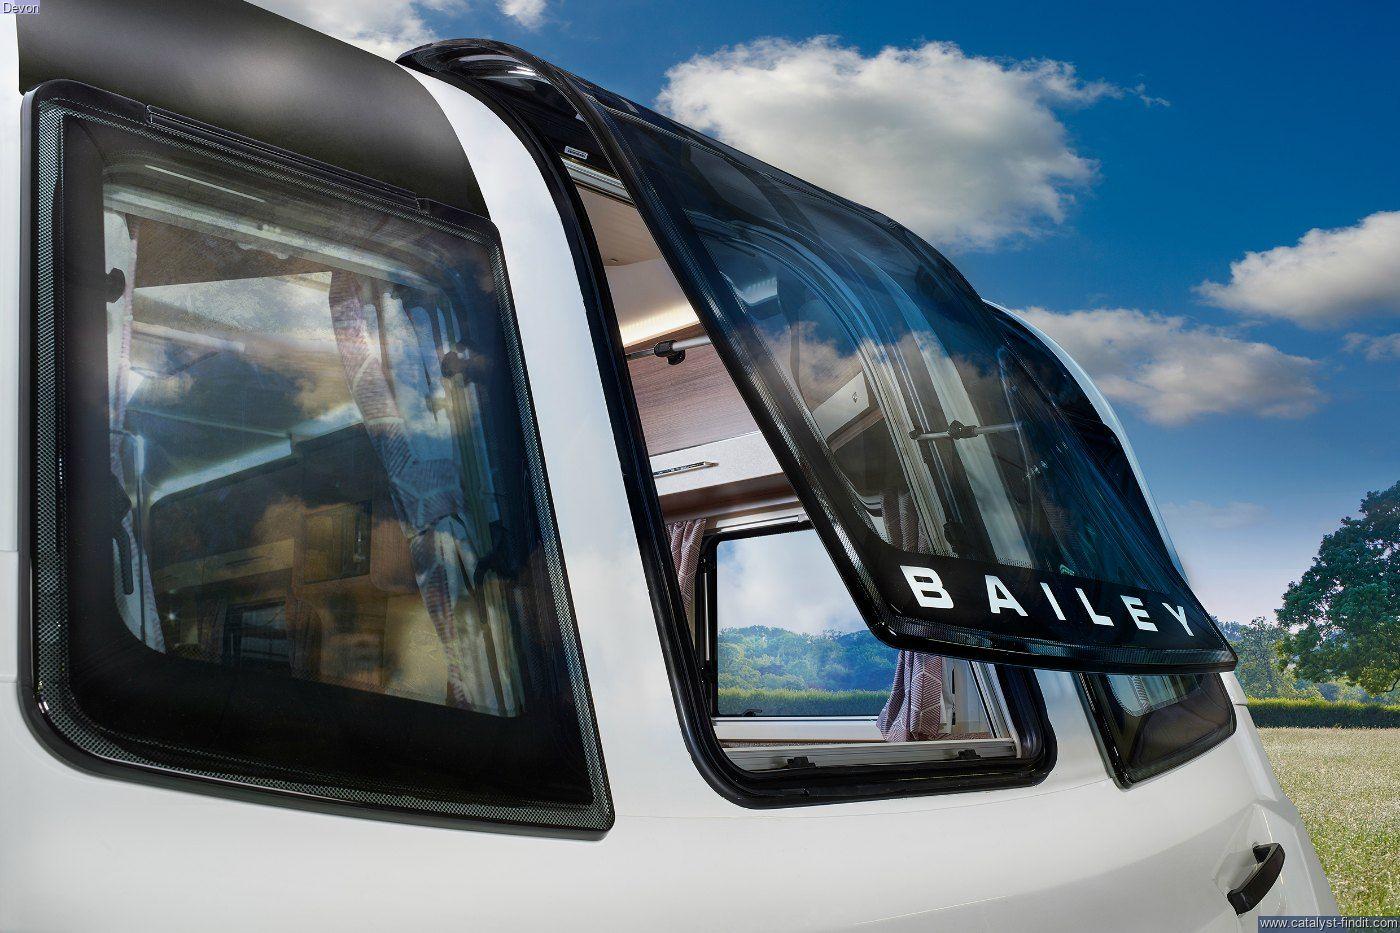 Bailey Pegasus Grande Rimini 2019